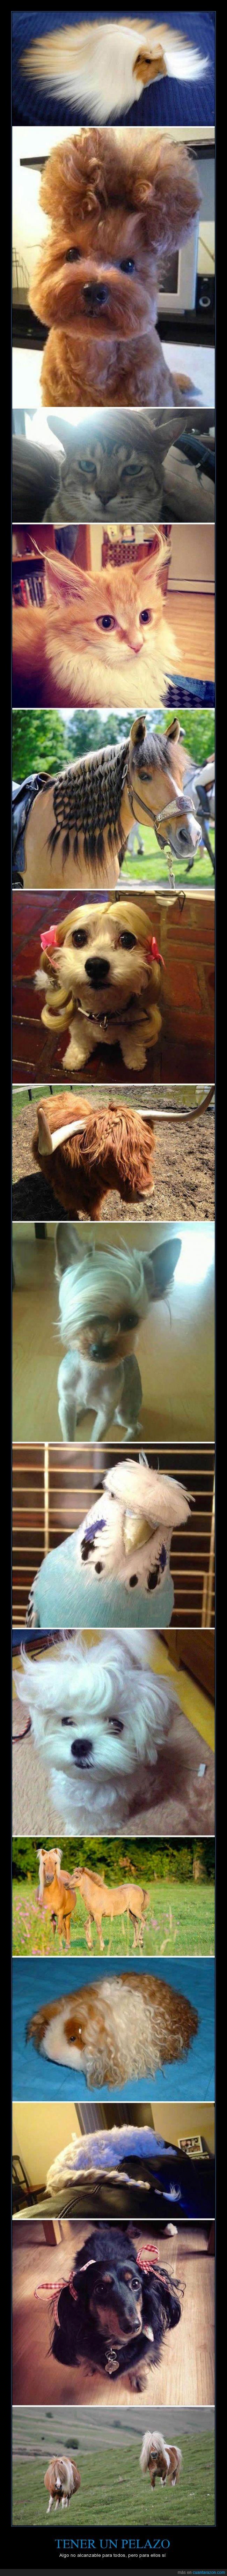 animal,caballo,cobaya,gato,hamster,pelazo,pelo,periquito,perro